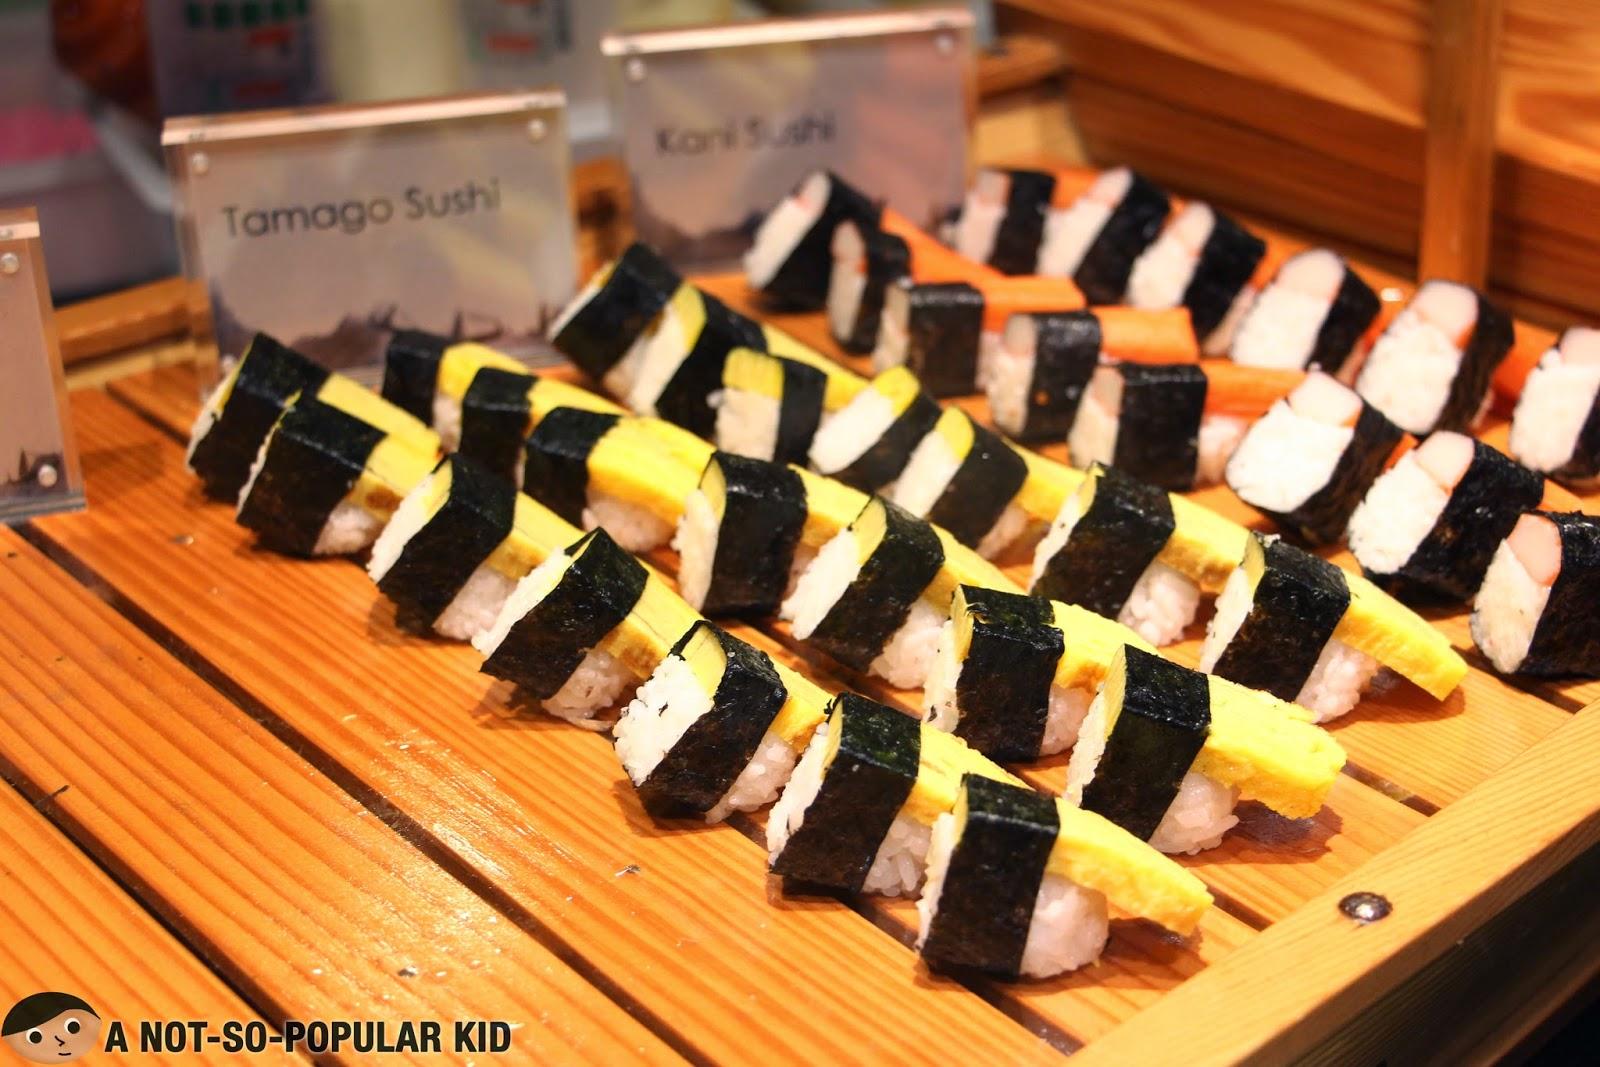 Tamago Sushi and Kani Sushi - some of your Japanese favorites in Vikings